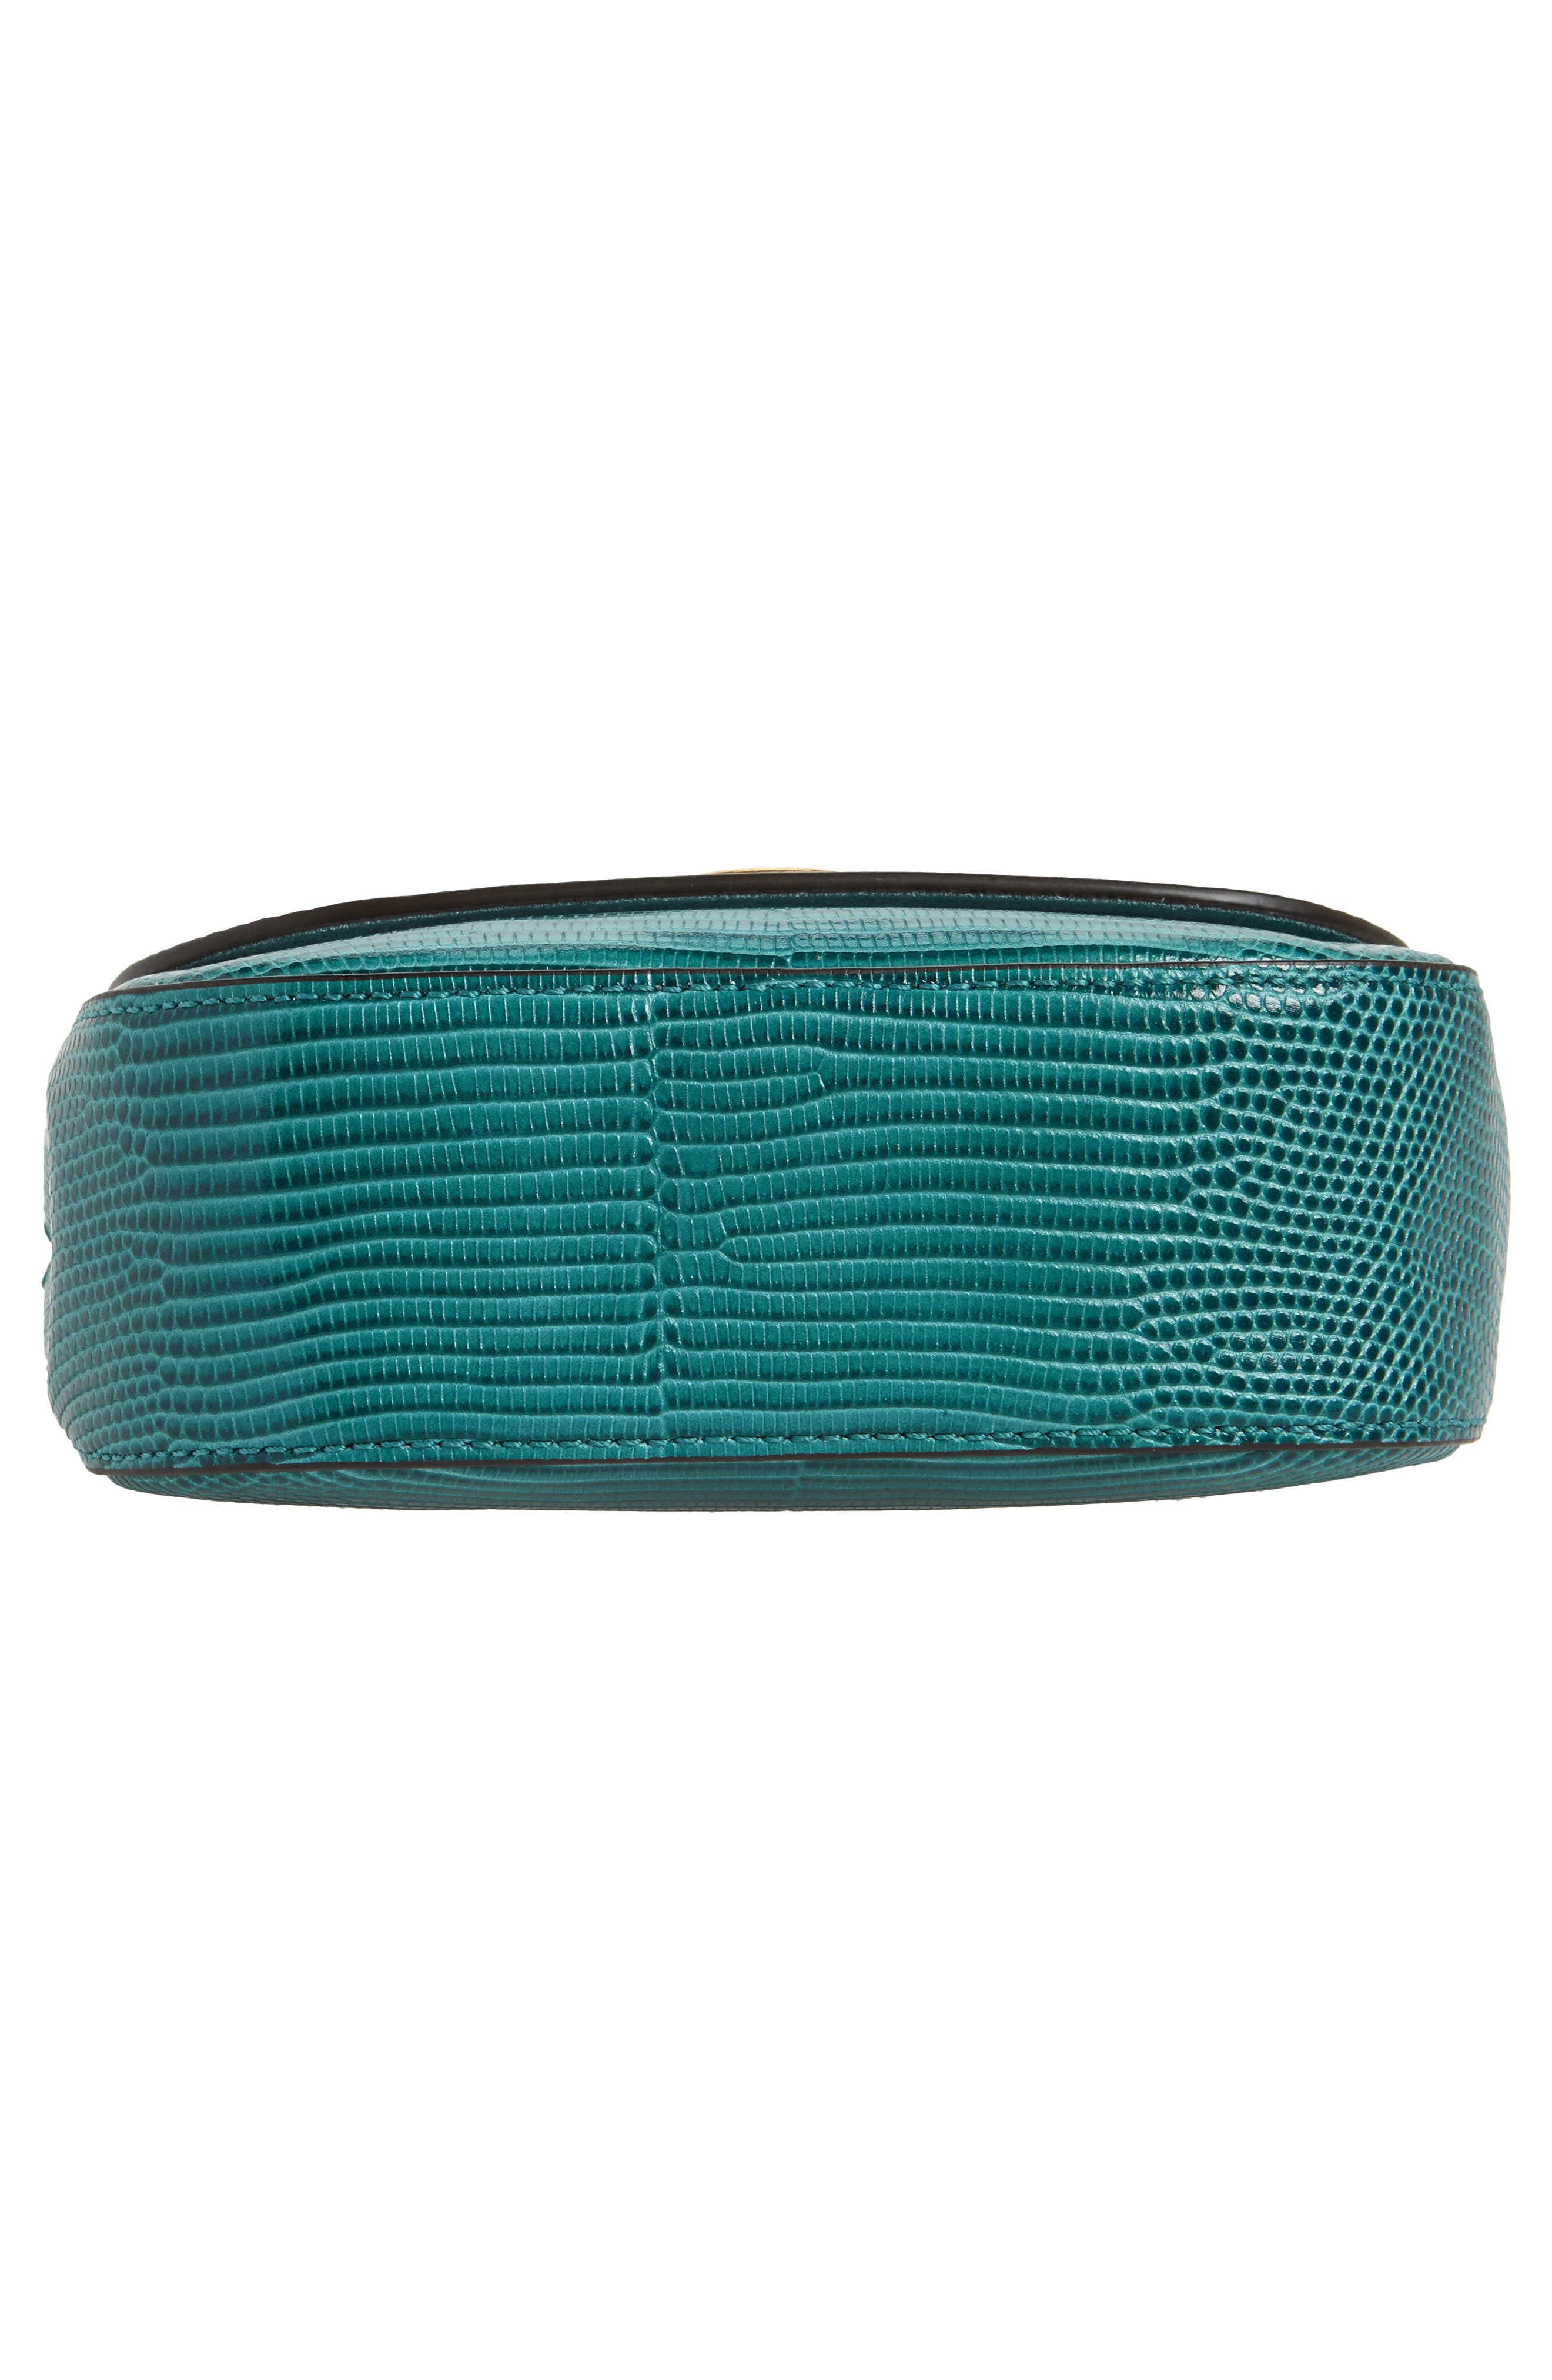 Mini Amberley Reptile Embossed Leather Crossbody Bag,                             Alternate thumbnail 6, color,                             401